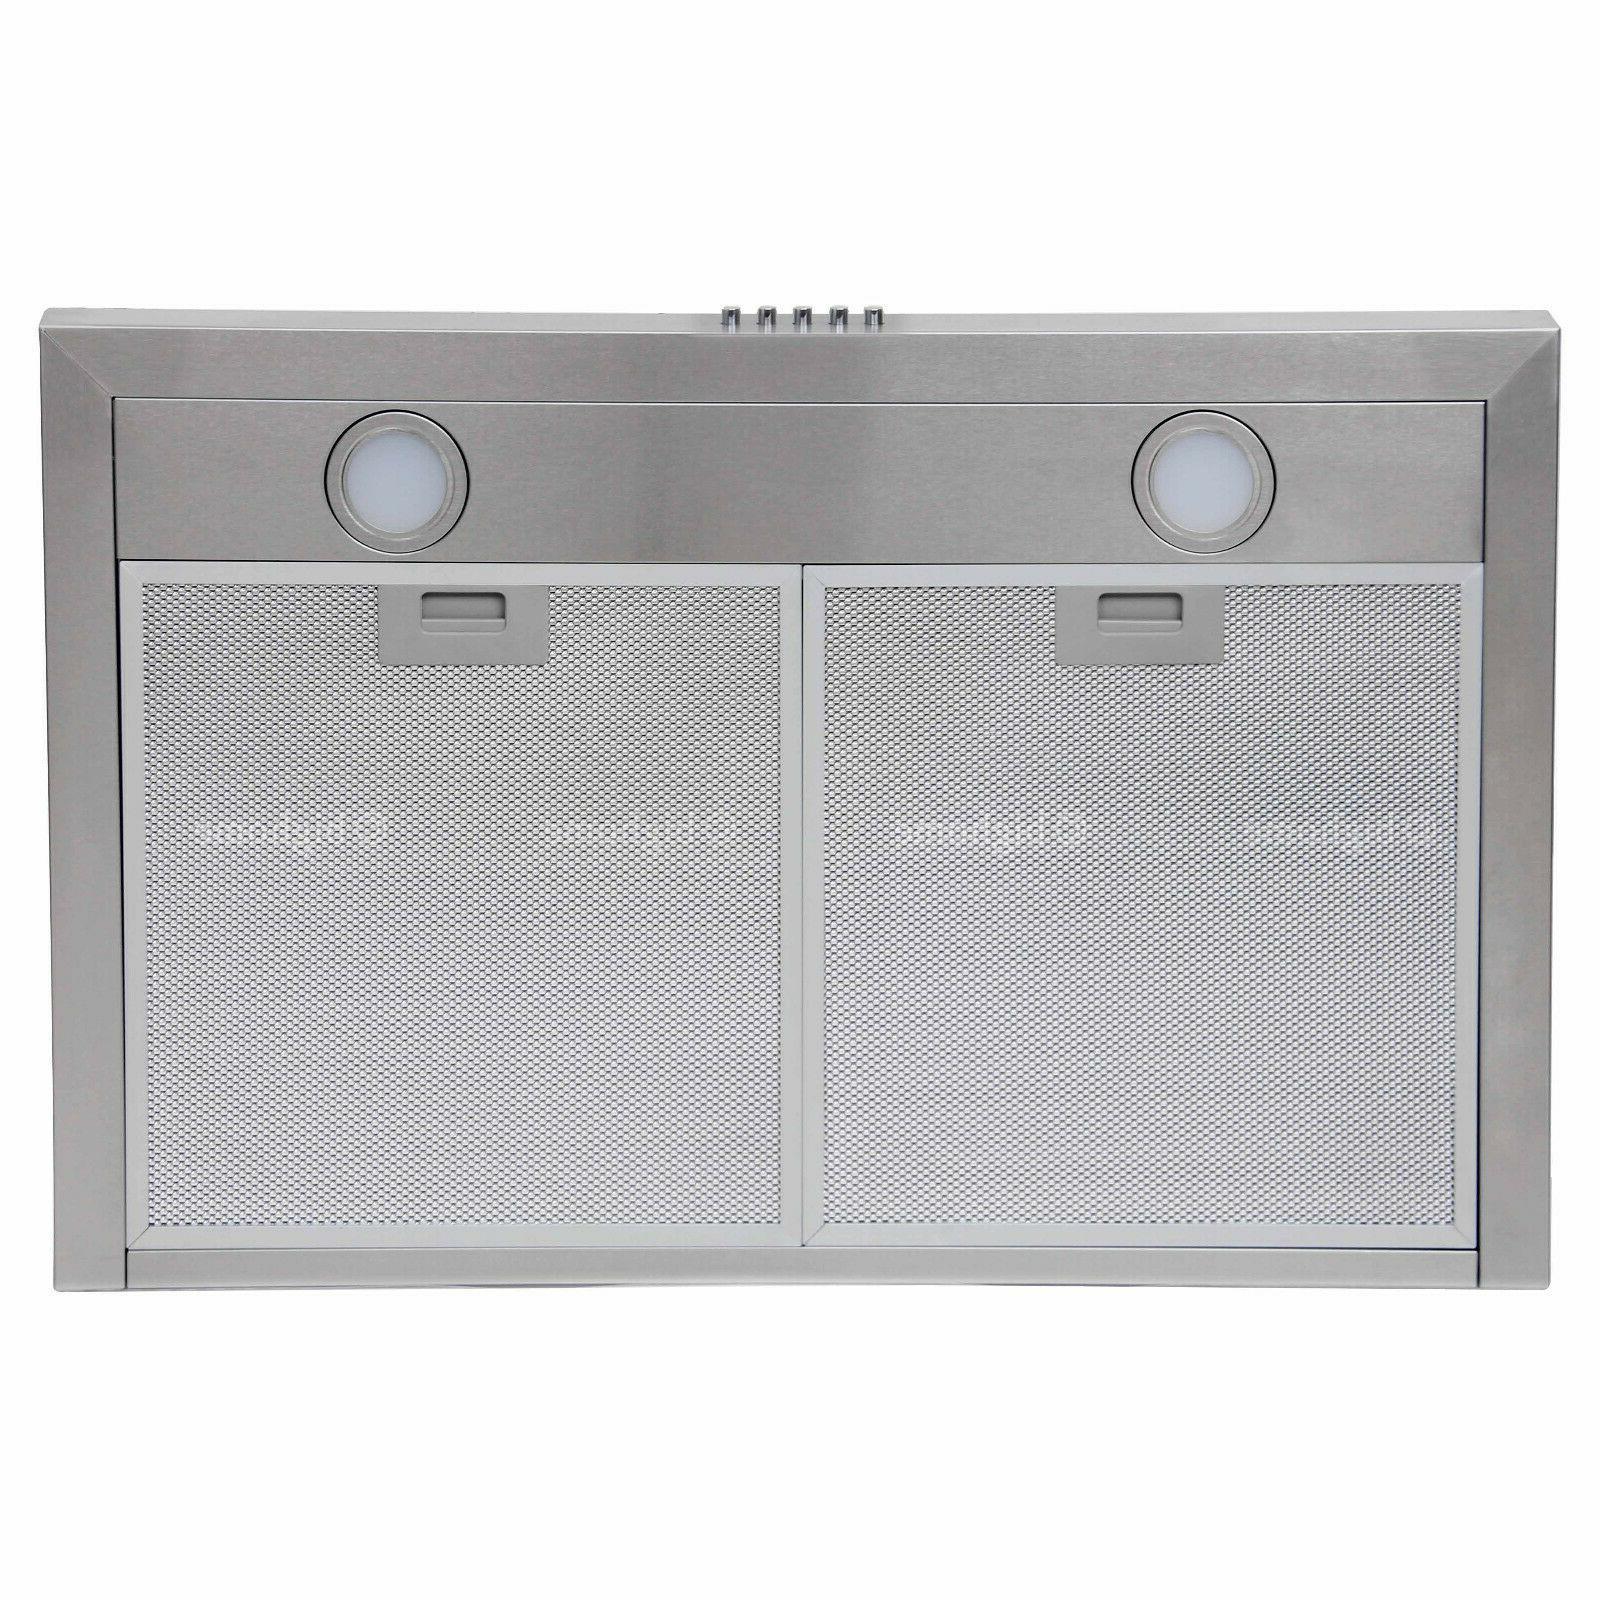 30 Range Hood Wall Steel Kitchen Stove Vent LED